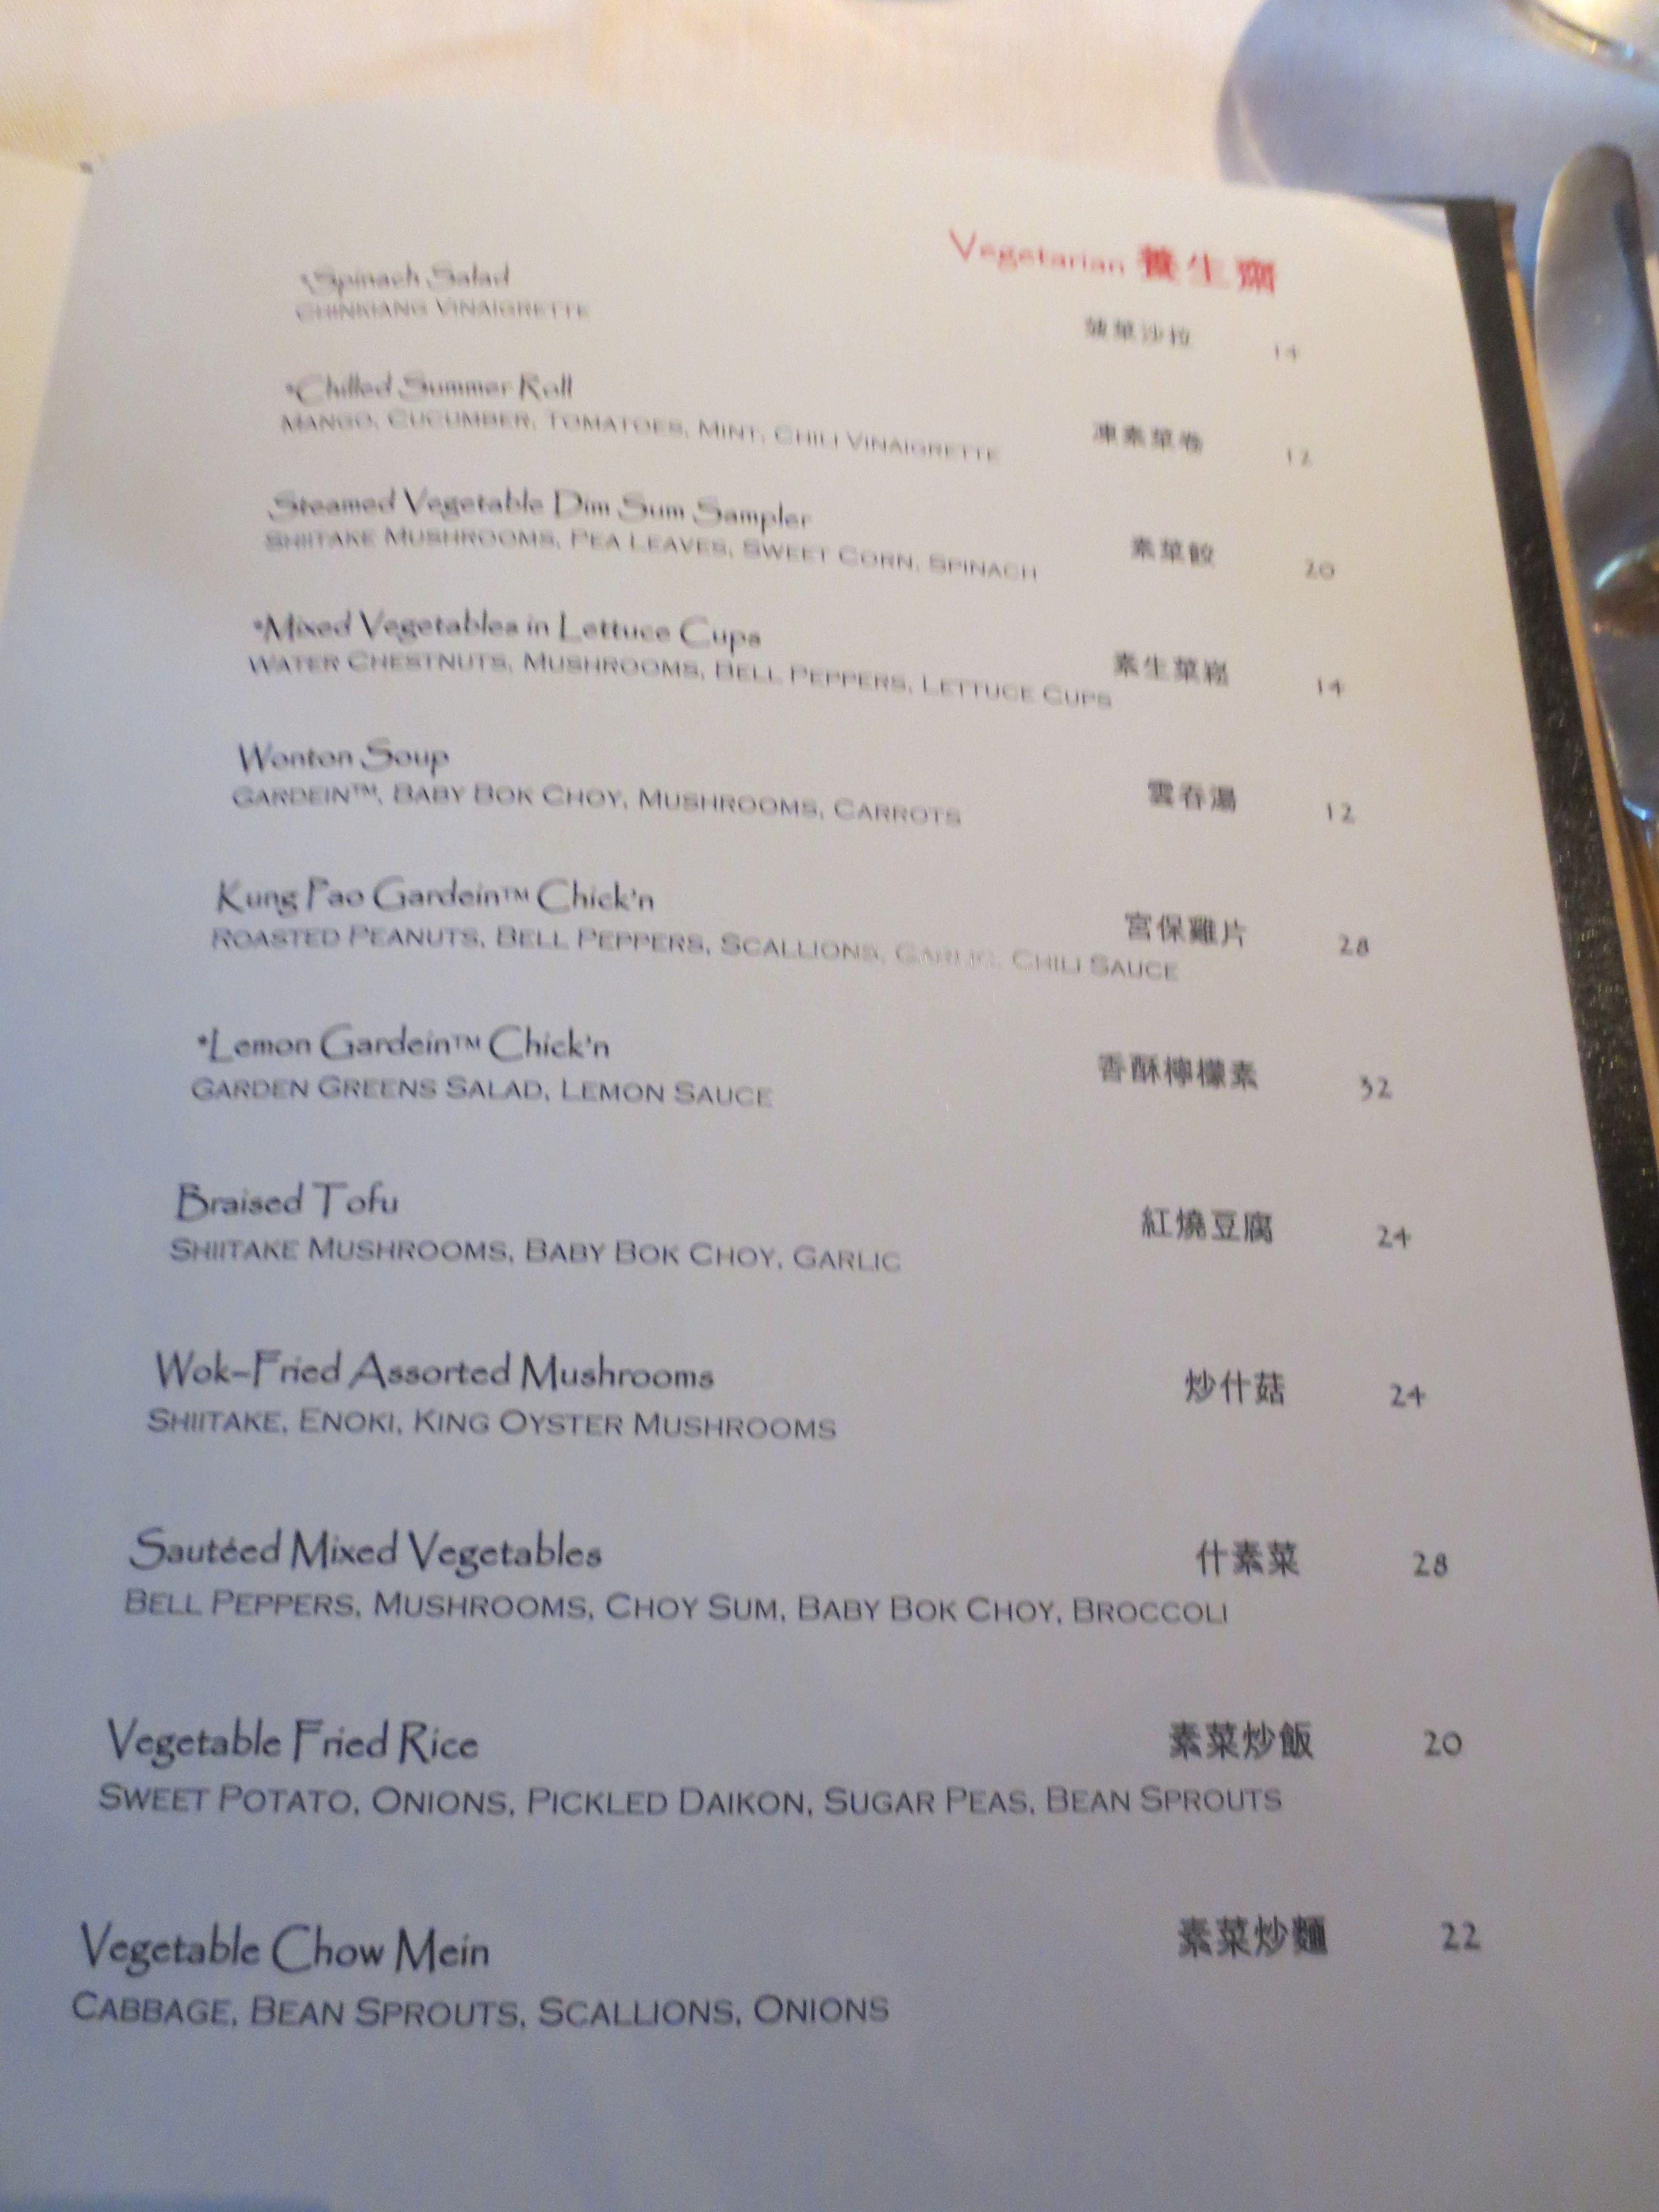 Wing Lei At The Wynn In Las Vegas, Vegan/Vegetarian Menu As Of Sept Part 8